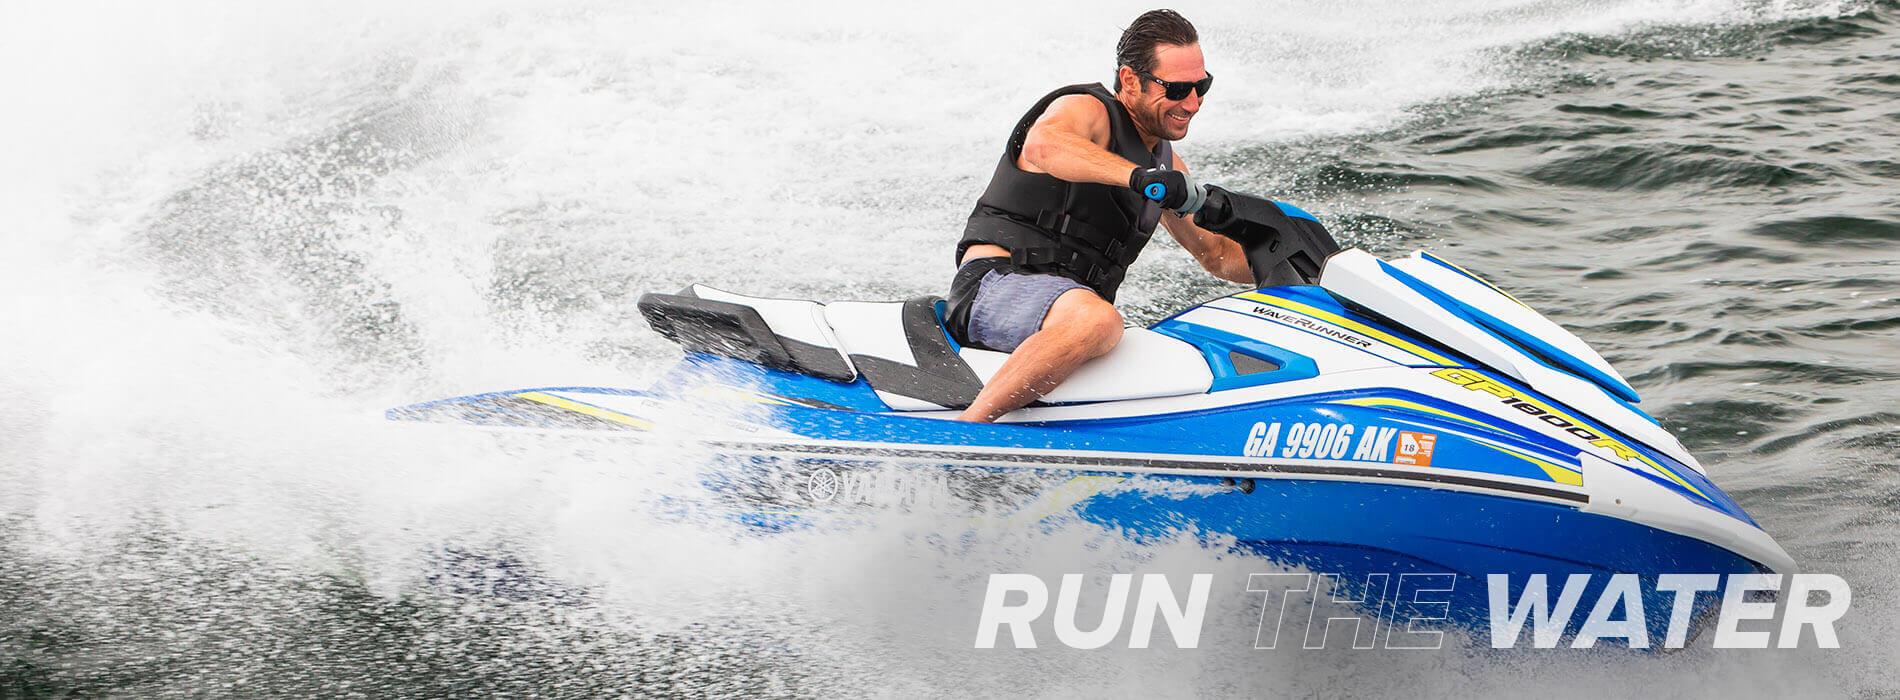 yamaha-waverunners-2019-gp1800r-blue-man-riding-rtw